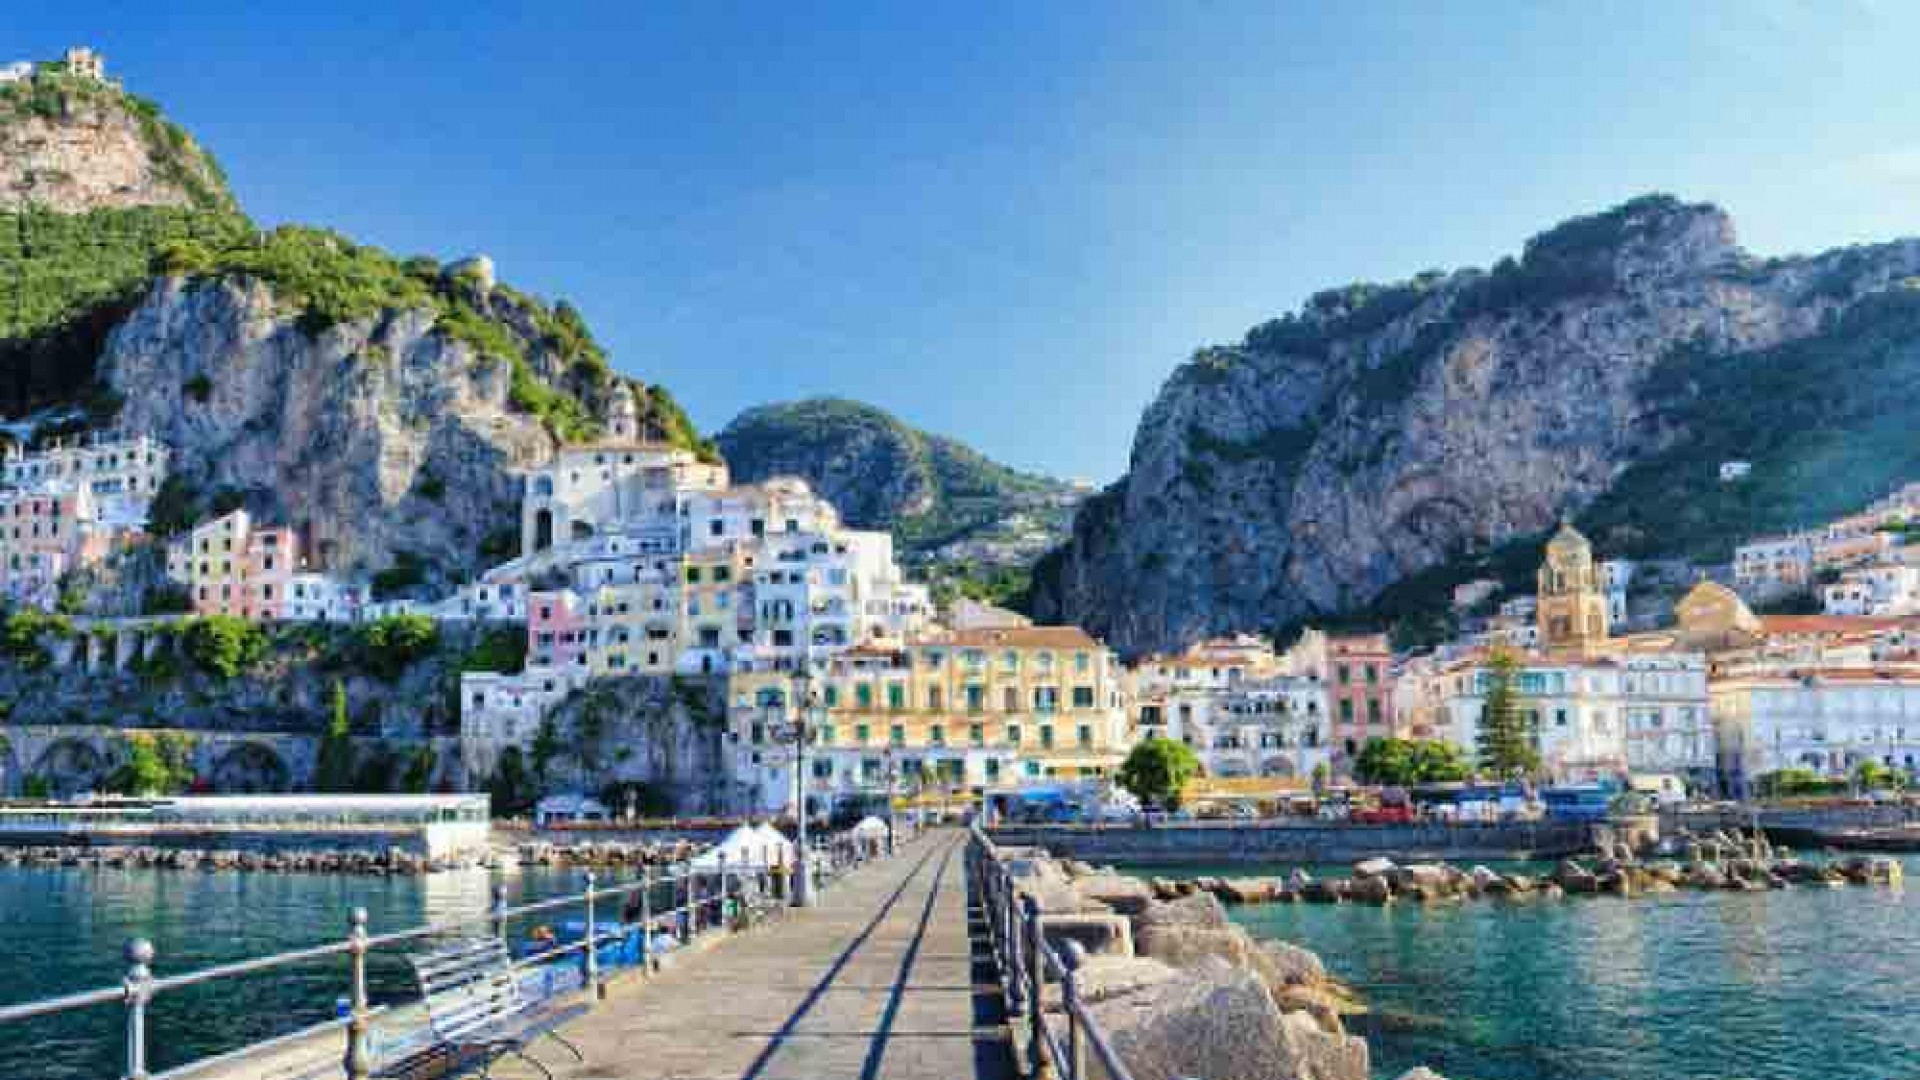 GRUPPI: Le Tre Perle del Mediterraneo: Paestum, e...